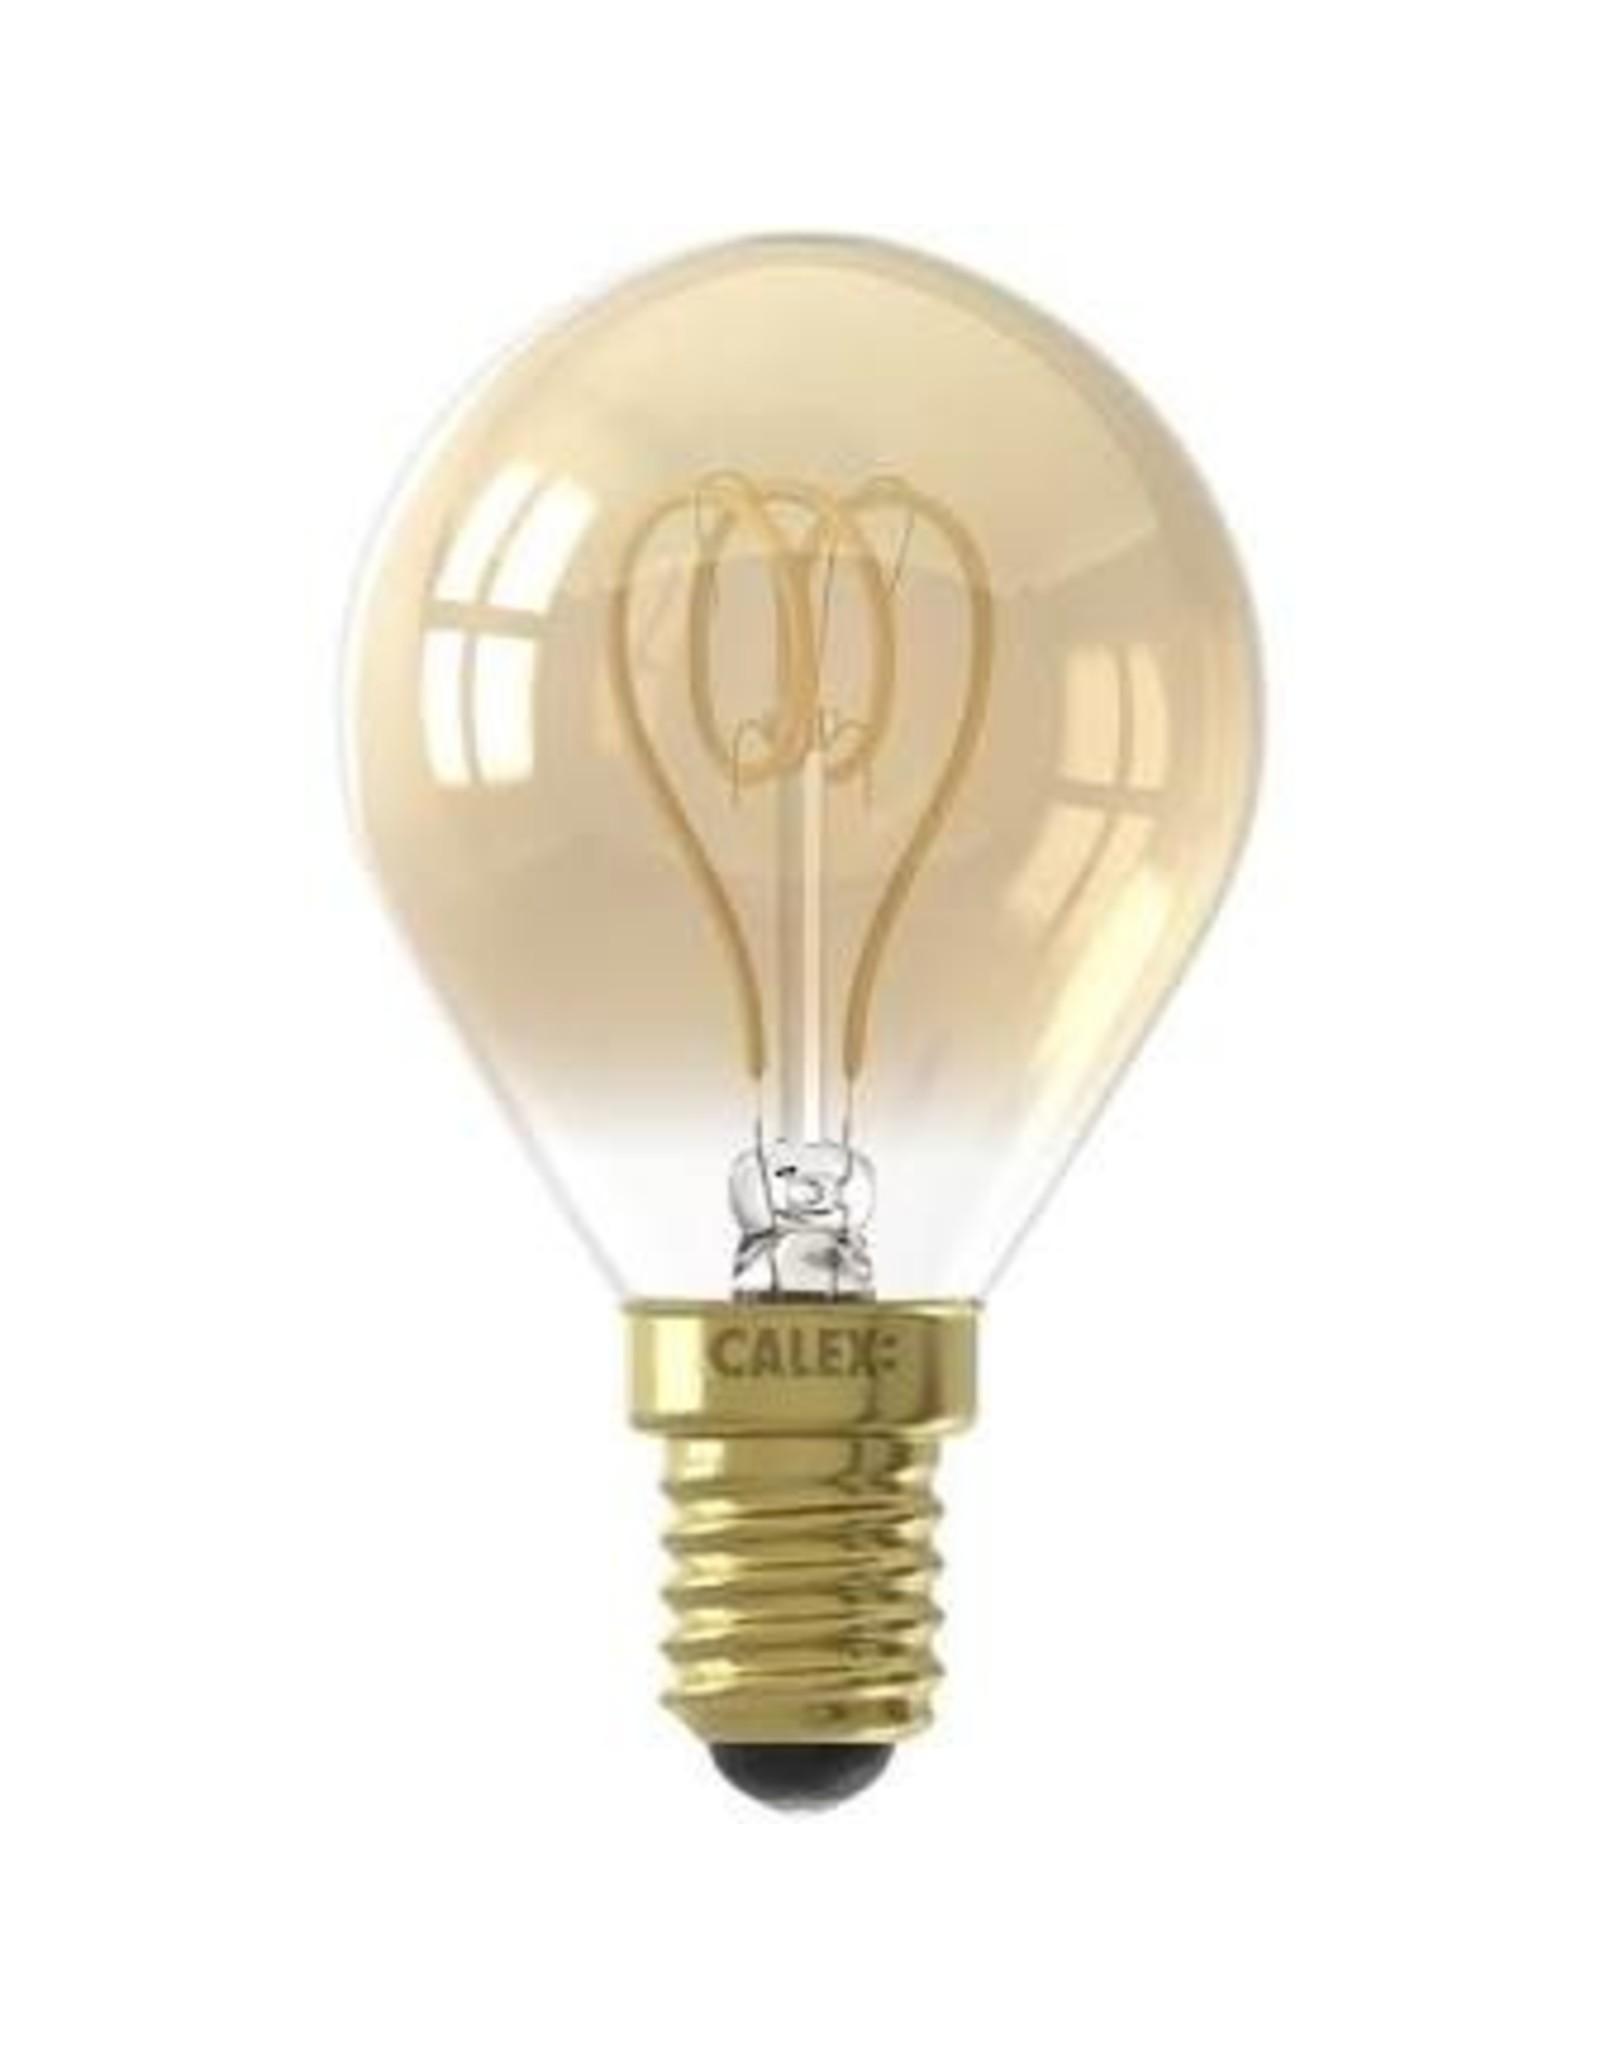 Calex LED Flex Filament Ball lamp P45 220-240V 4W E14 120lm 2100K Gold, dimmable, energy label B